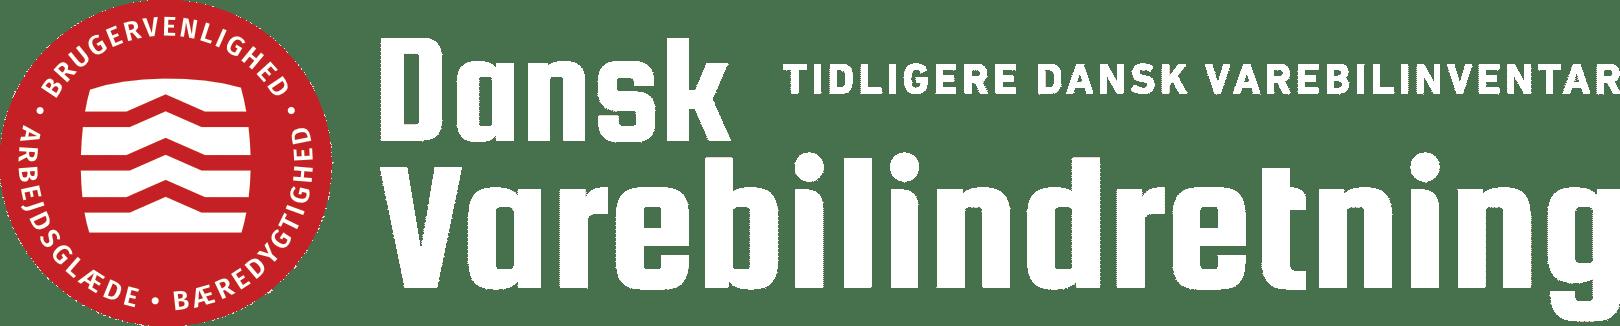 Dansk Varebilindretning logo negativ ok